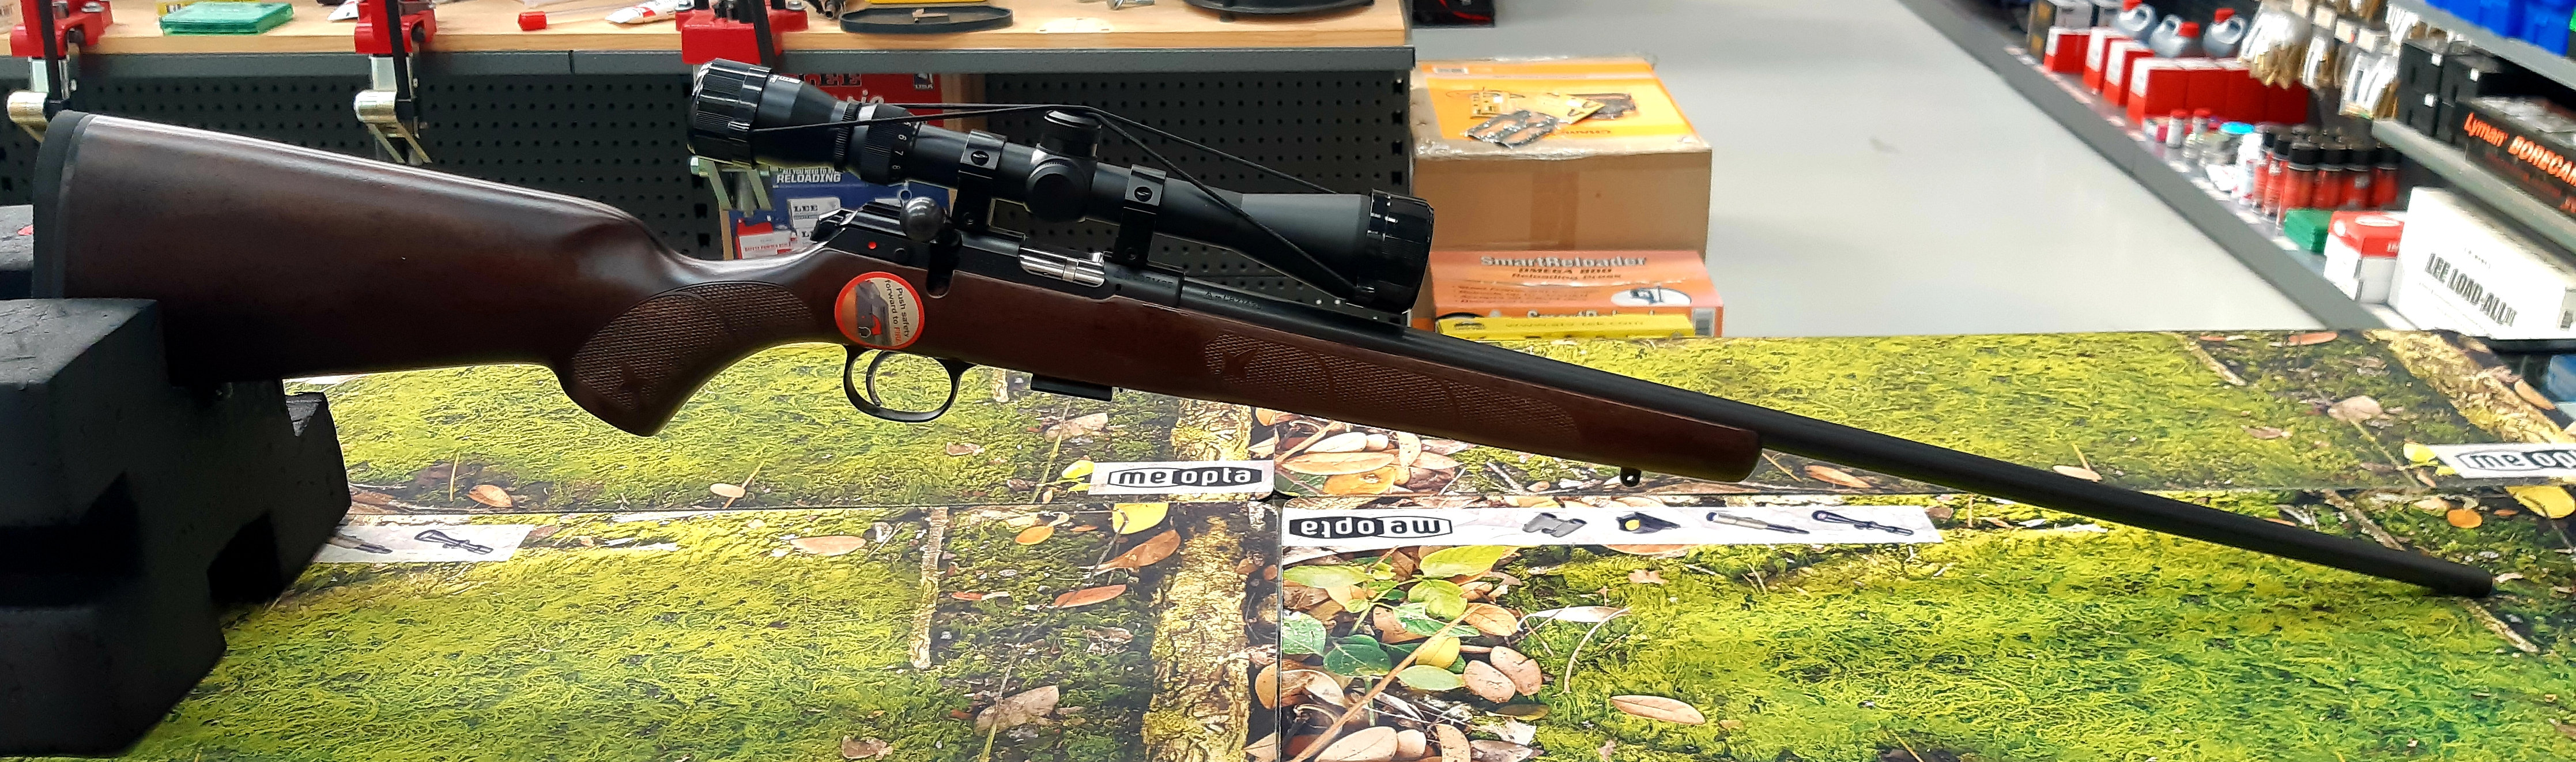 CZ 457 American 22lr Package 2   sunburyfirearms